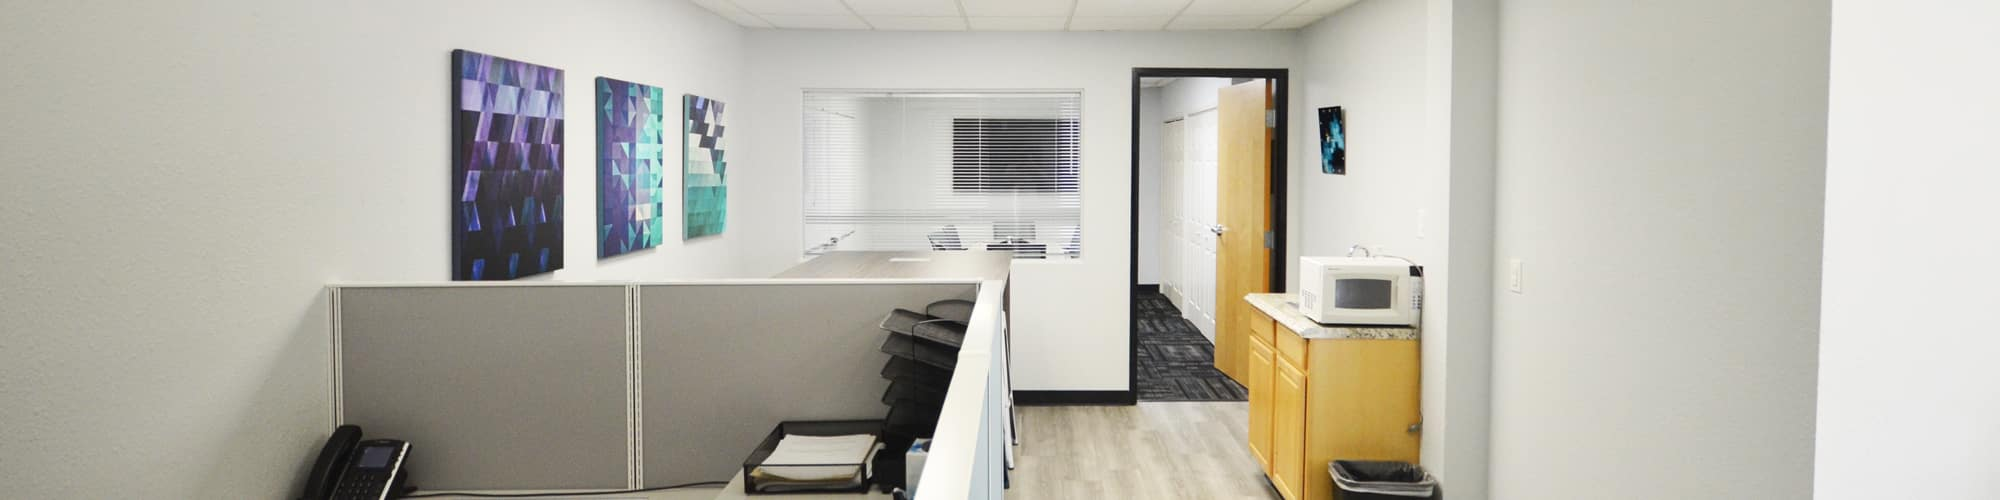 Research Business Park 2 Suite 203 Sublease